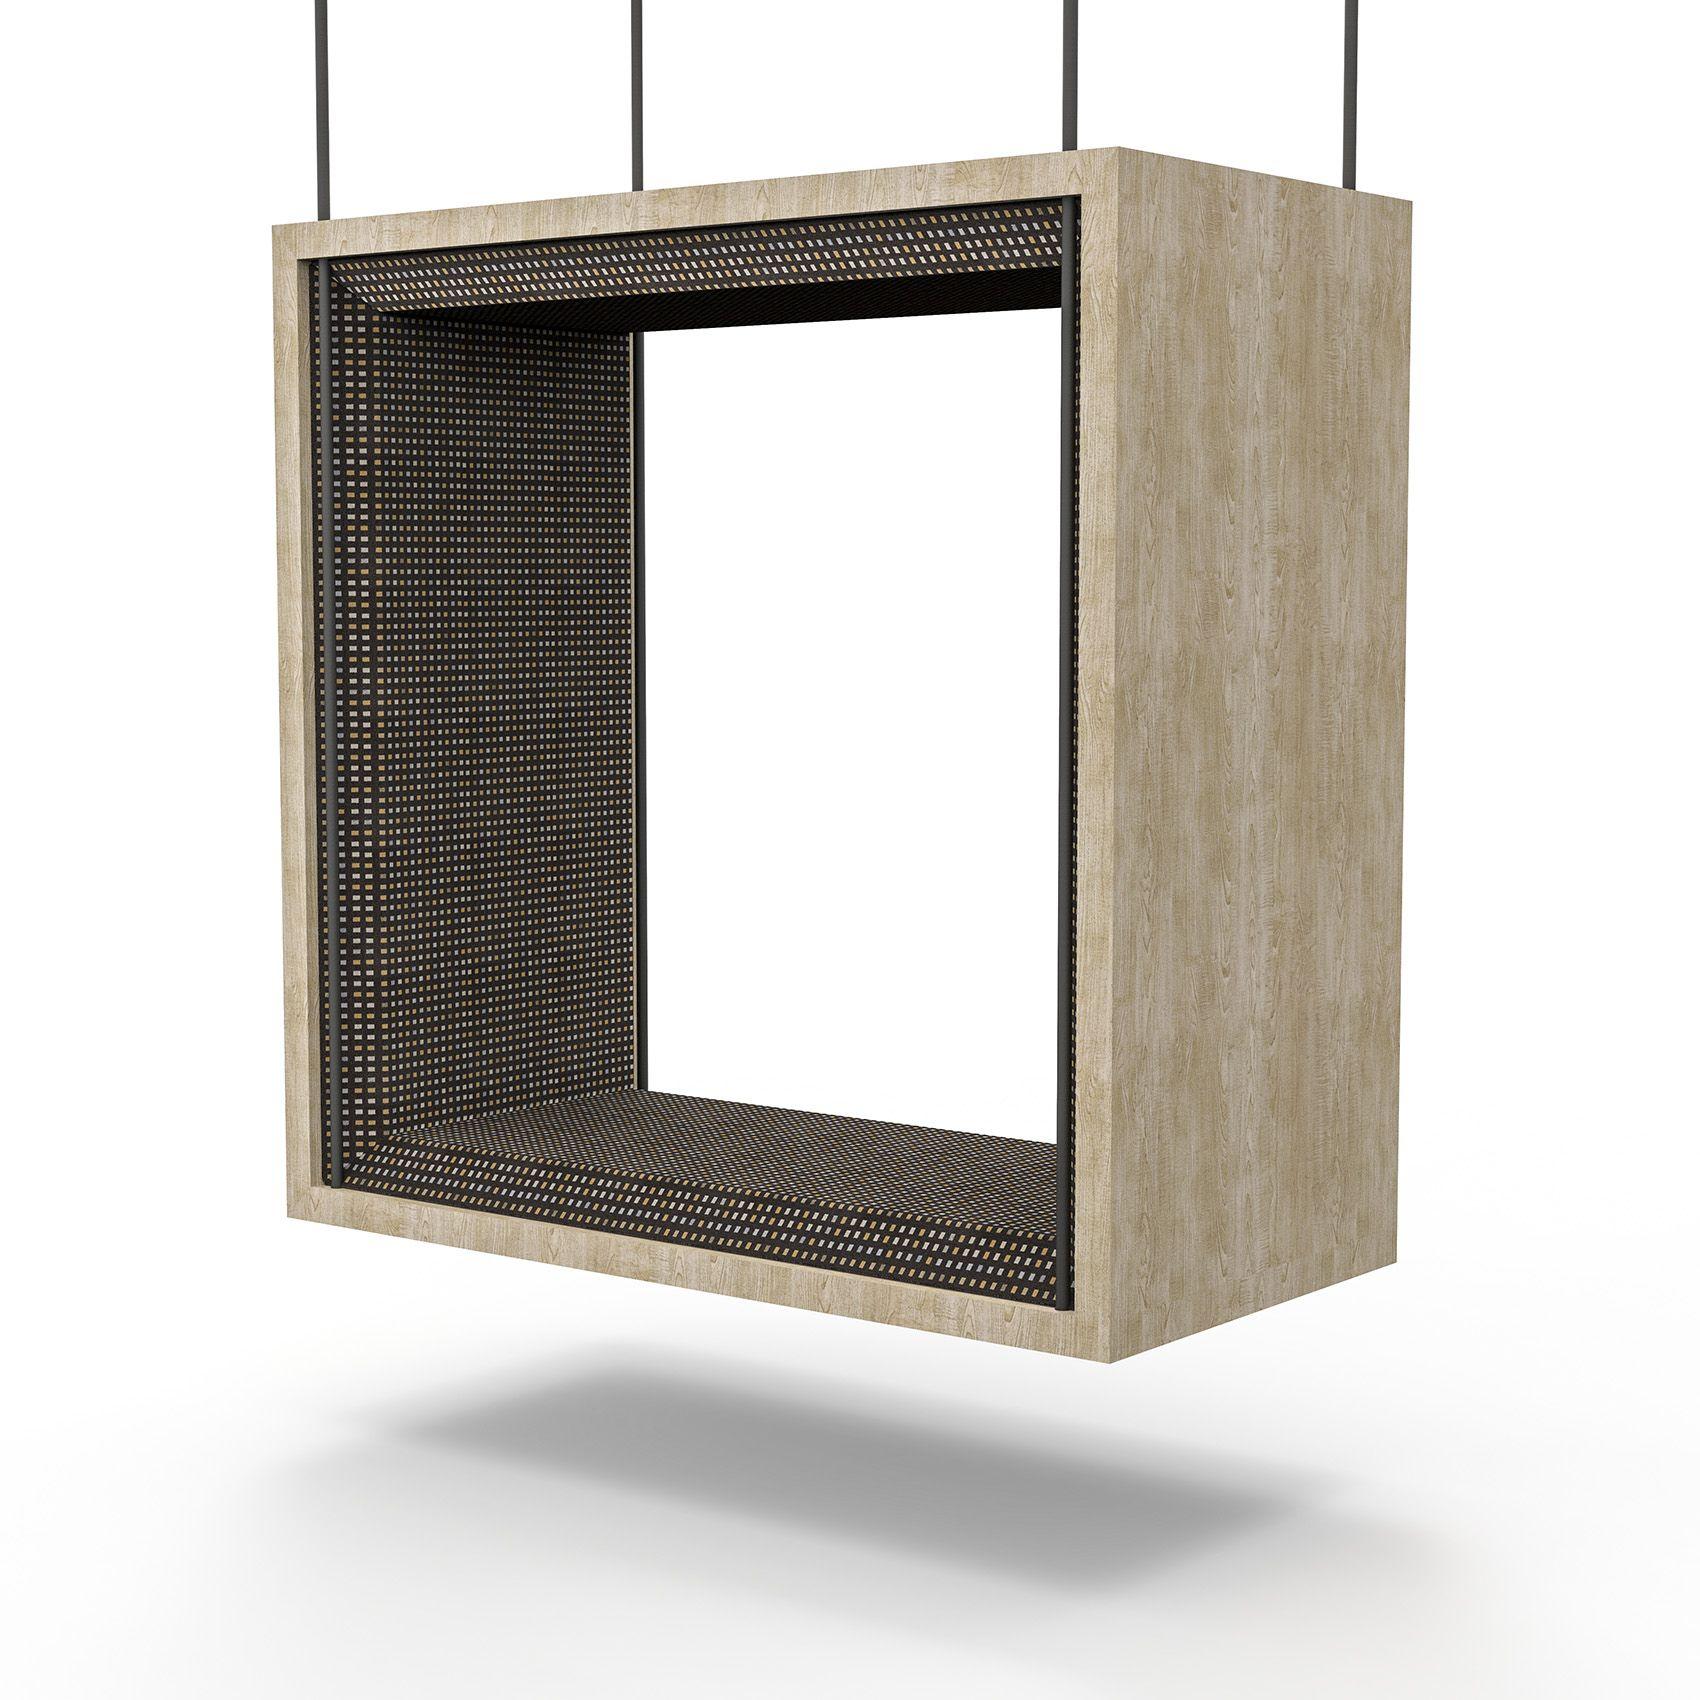 Wood Frame Box Swing Fully Upholstered Along All Four Sides